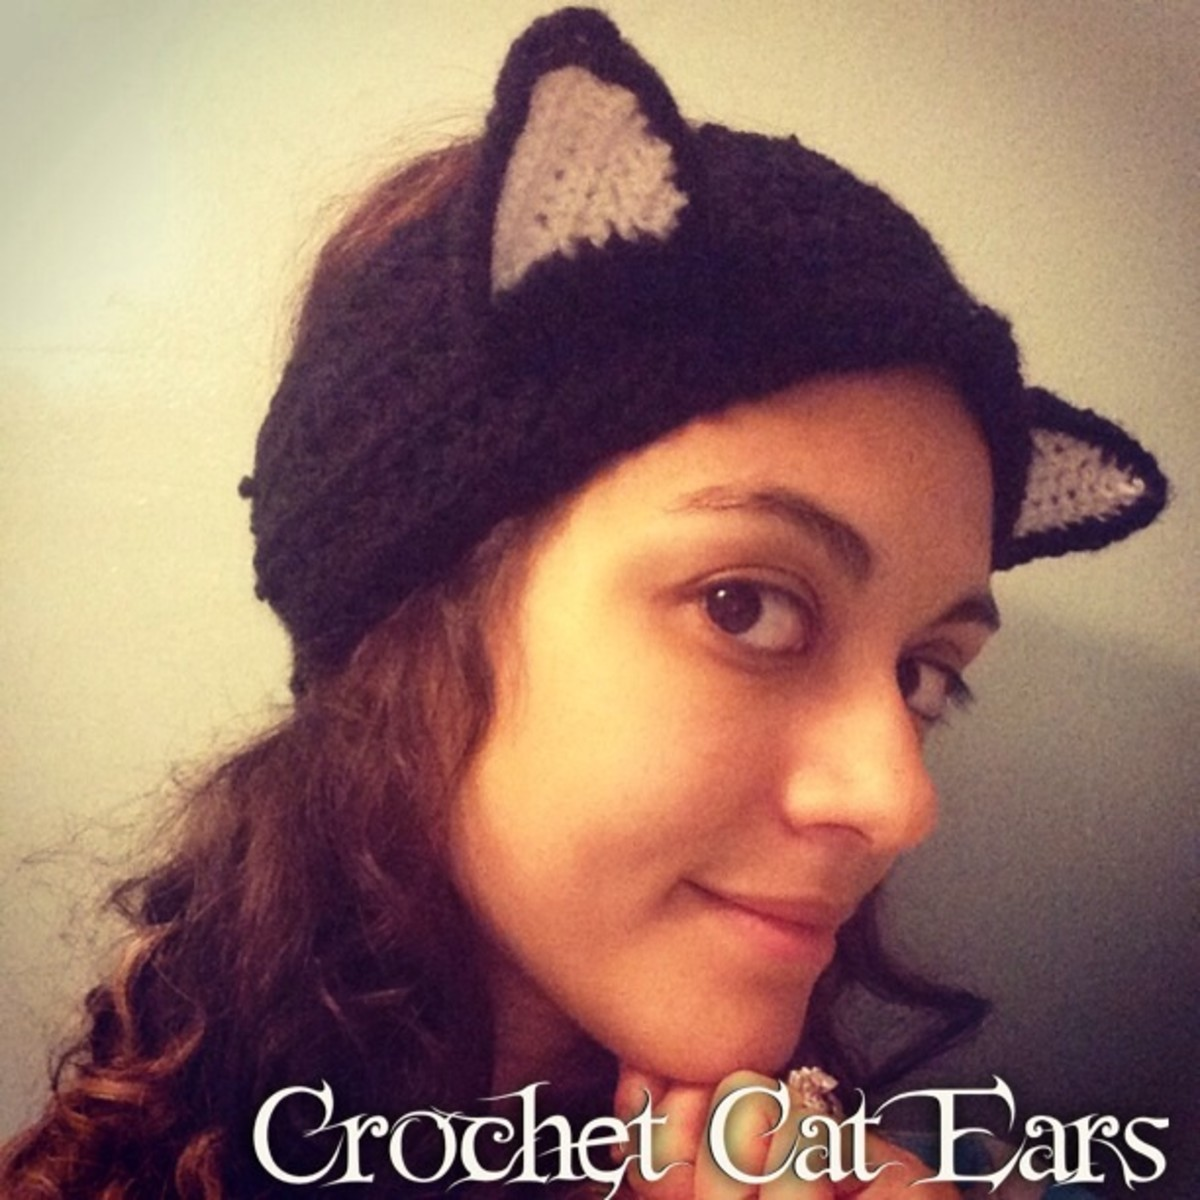 Crochet cat ears headband